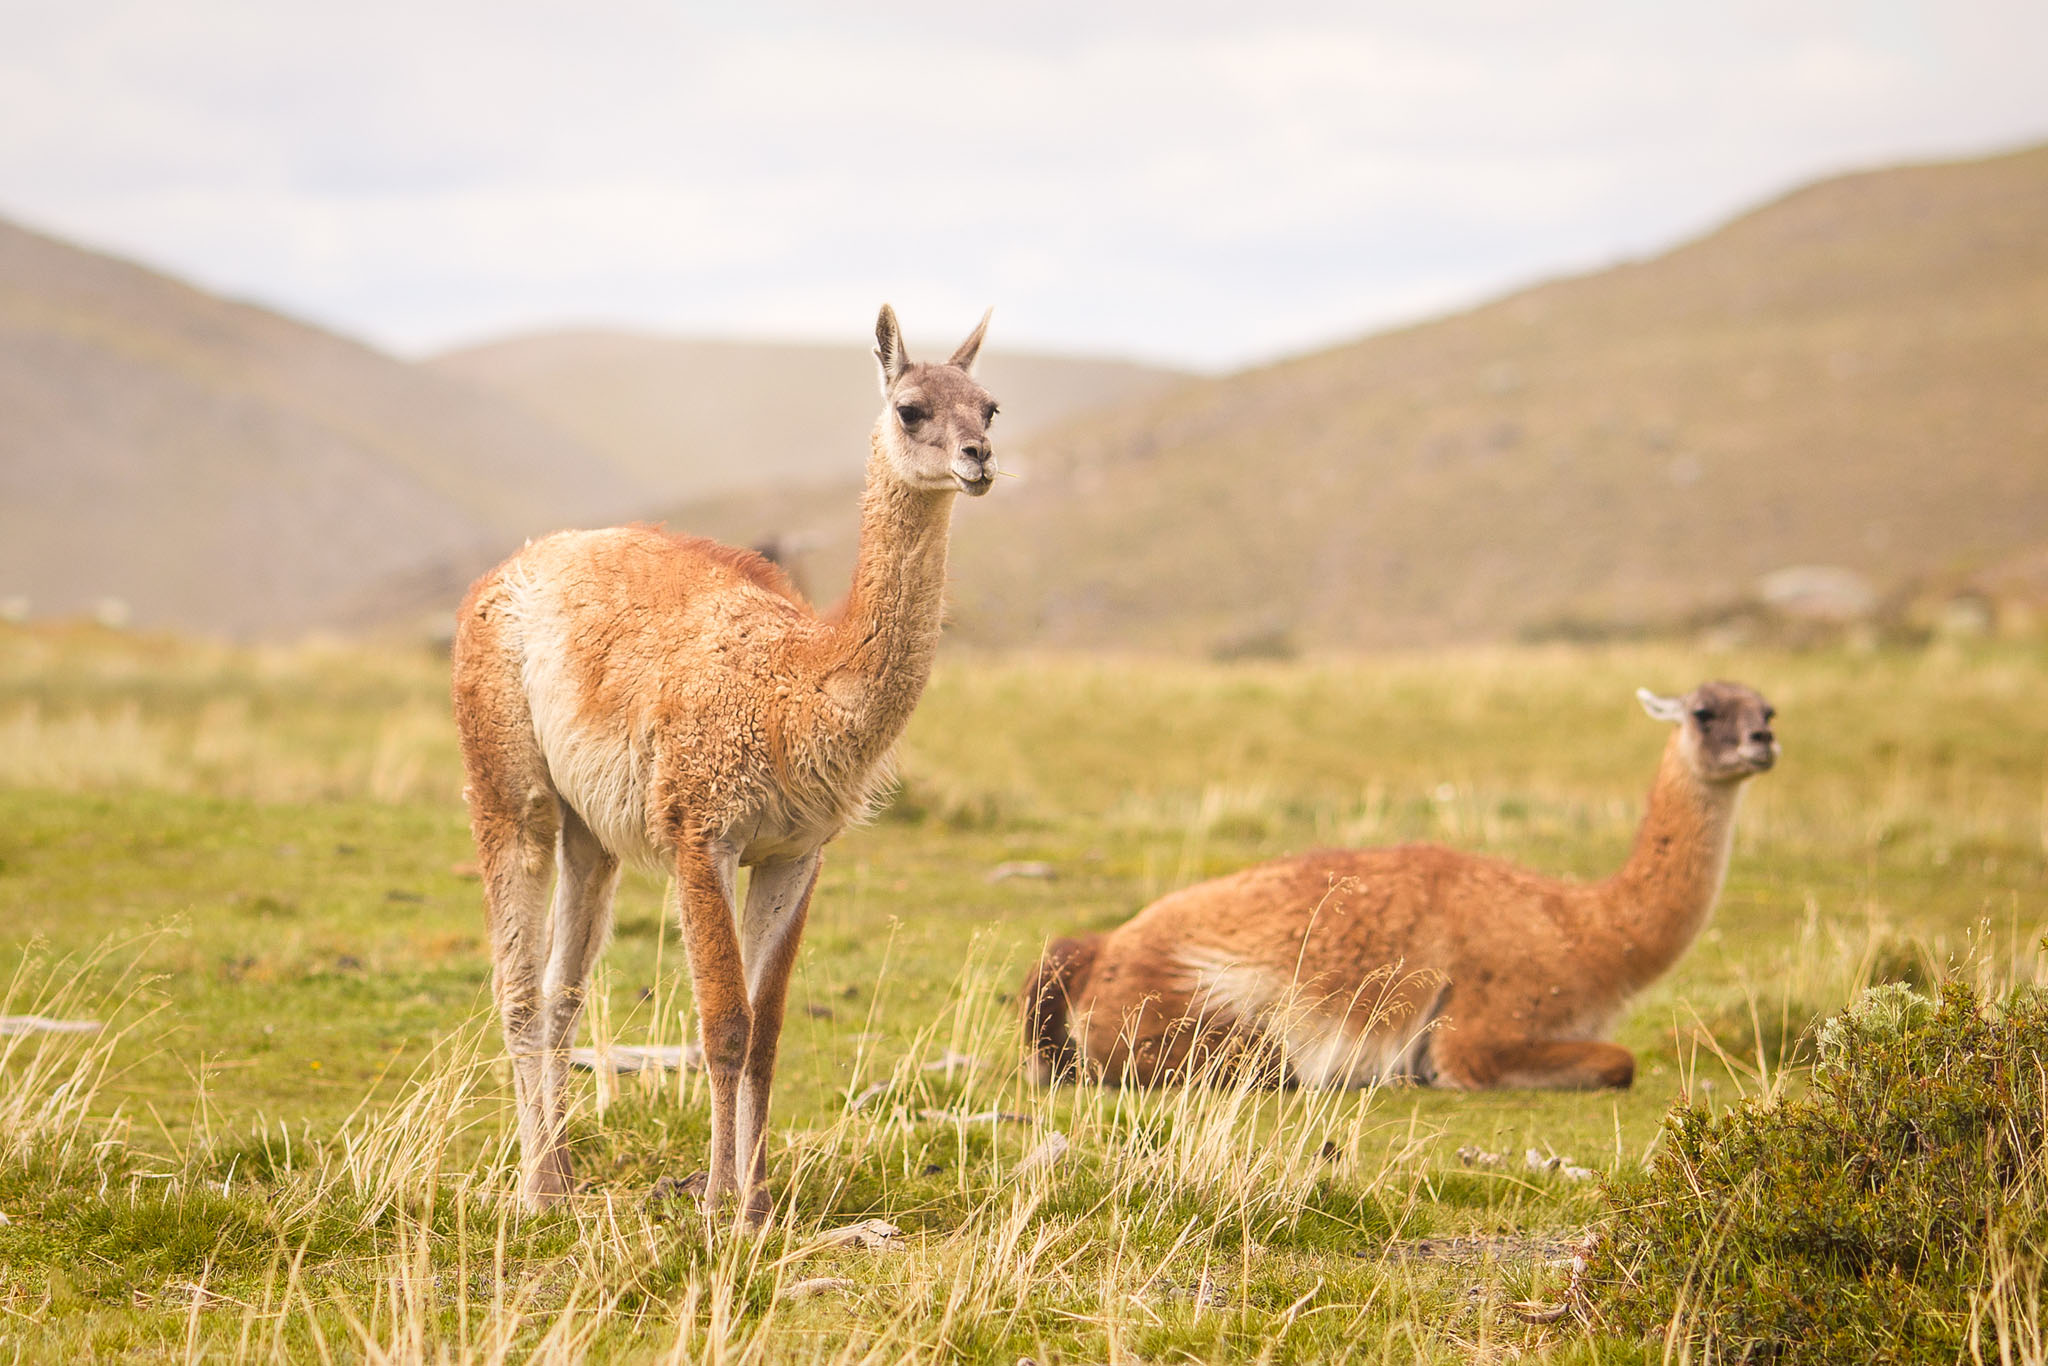 Wedding-Travellers-Overlanding-Destination-Wedding-Chile-Torres-del-Paine-chewing-llama-guanaco